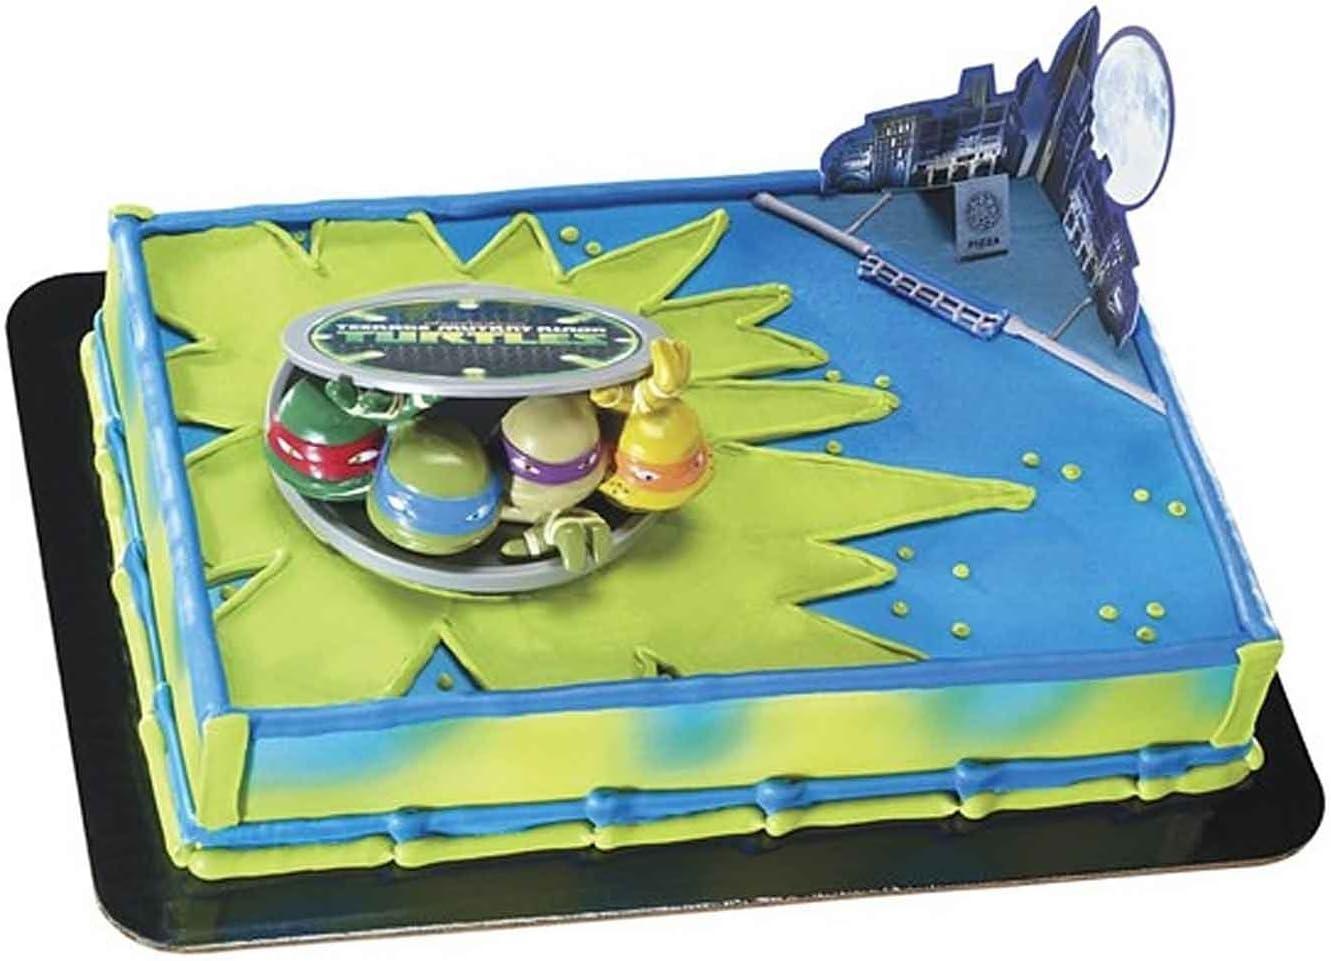 Fine Teenage Mutant Ninja Turtles Turtles To Action Decoset Cake Funny Birthday Cards Online Bapapcheapnameinfo